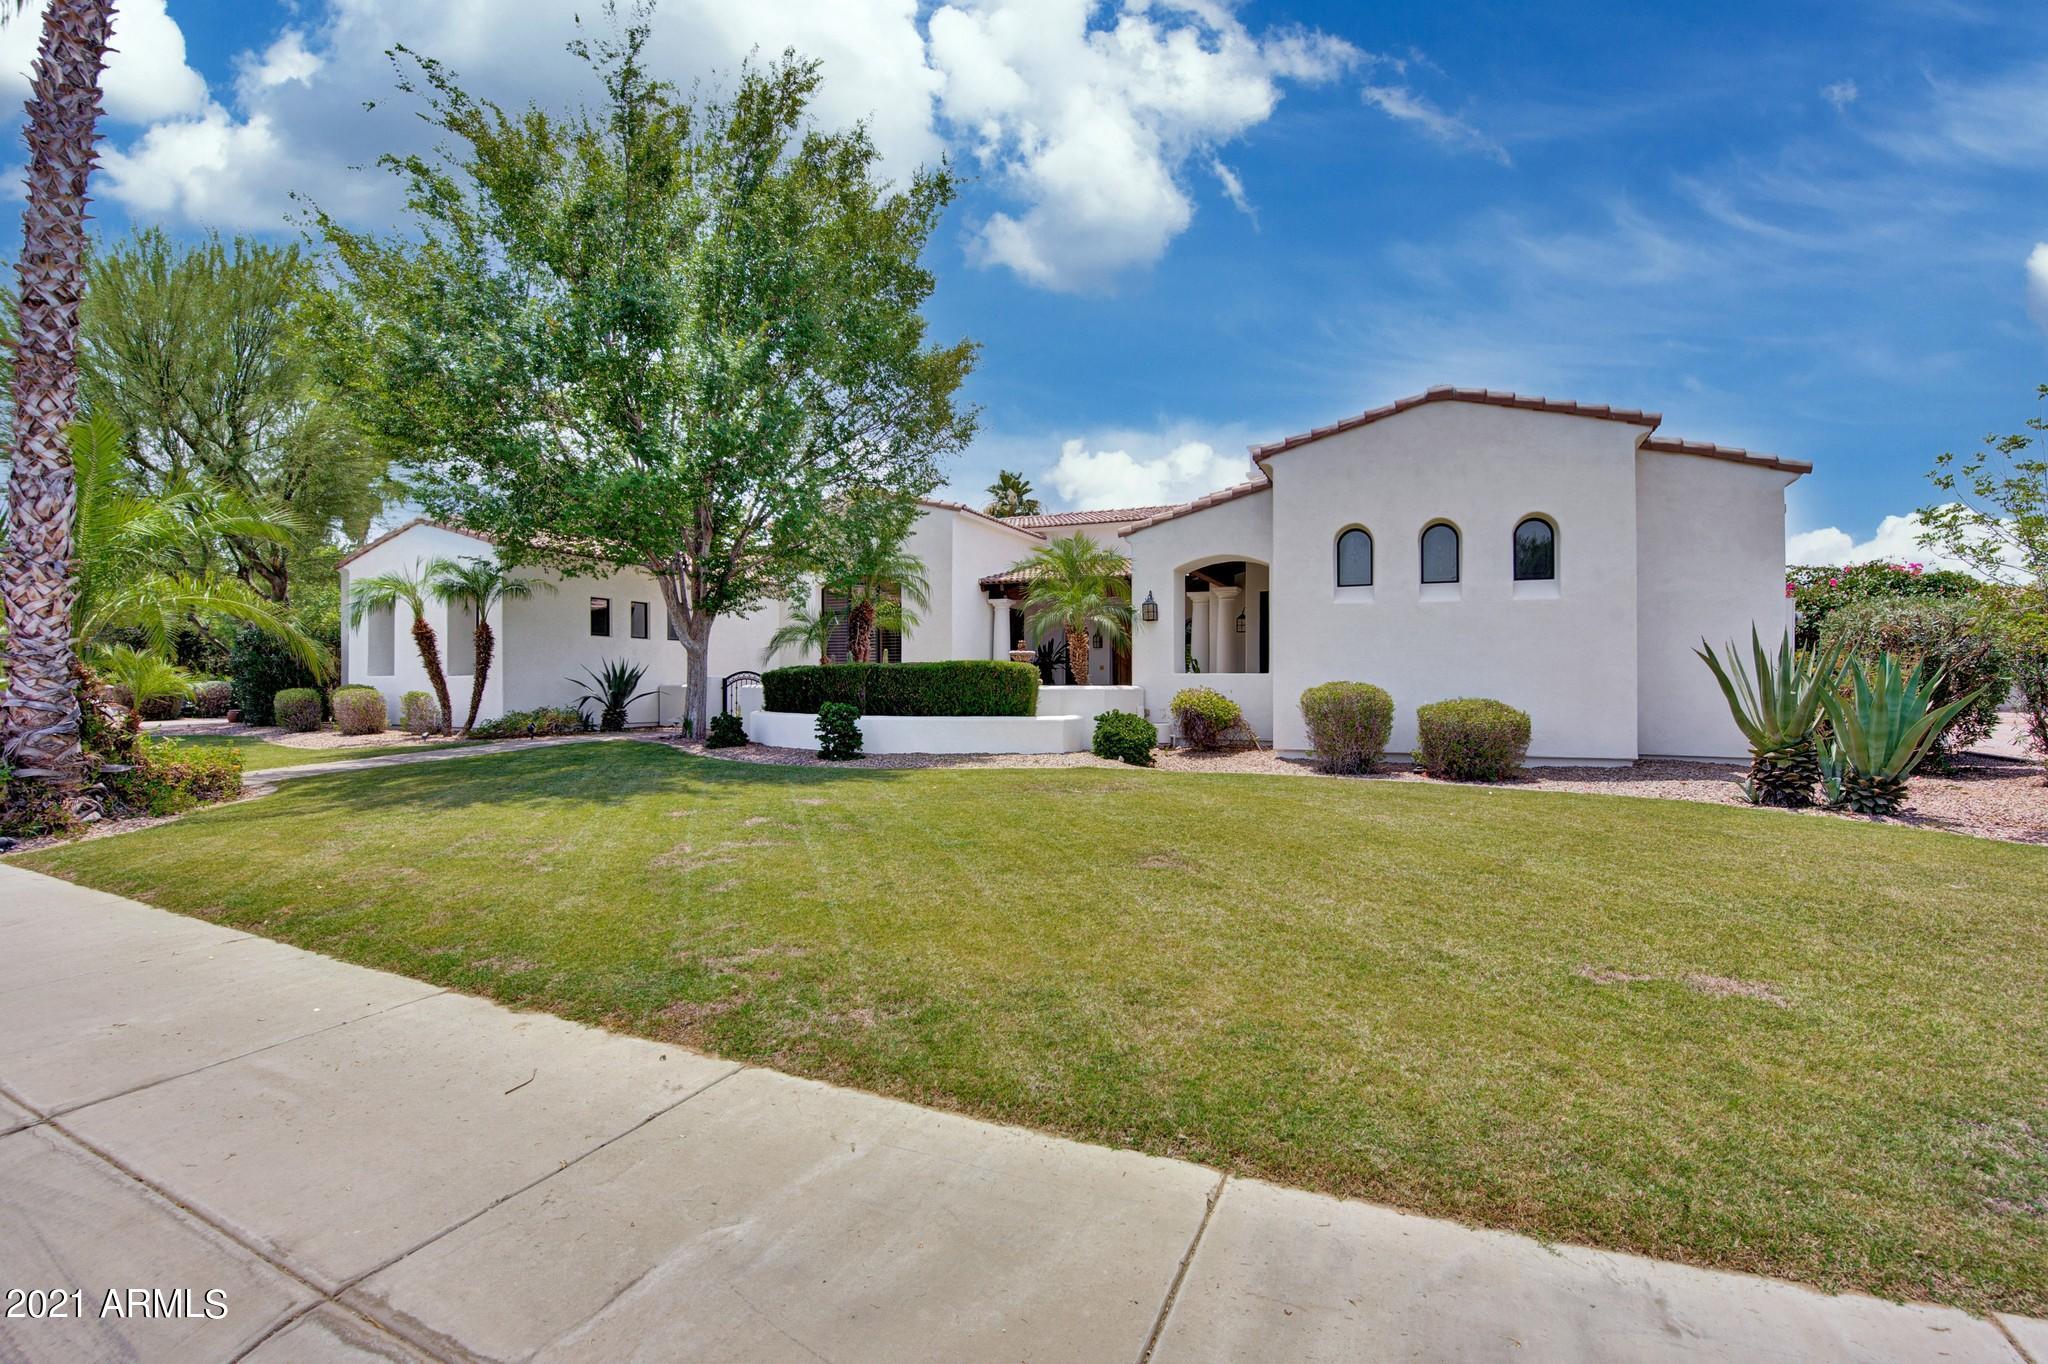 4325 E VIRGO Place, Chandler, AZ 85249, 4 Bedrooms Bedrooms, ,Residential,For Sale,4325 E VIRGO Place,6252407